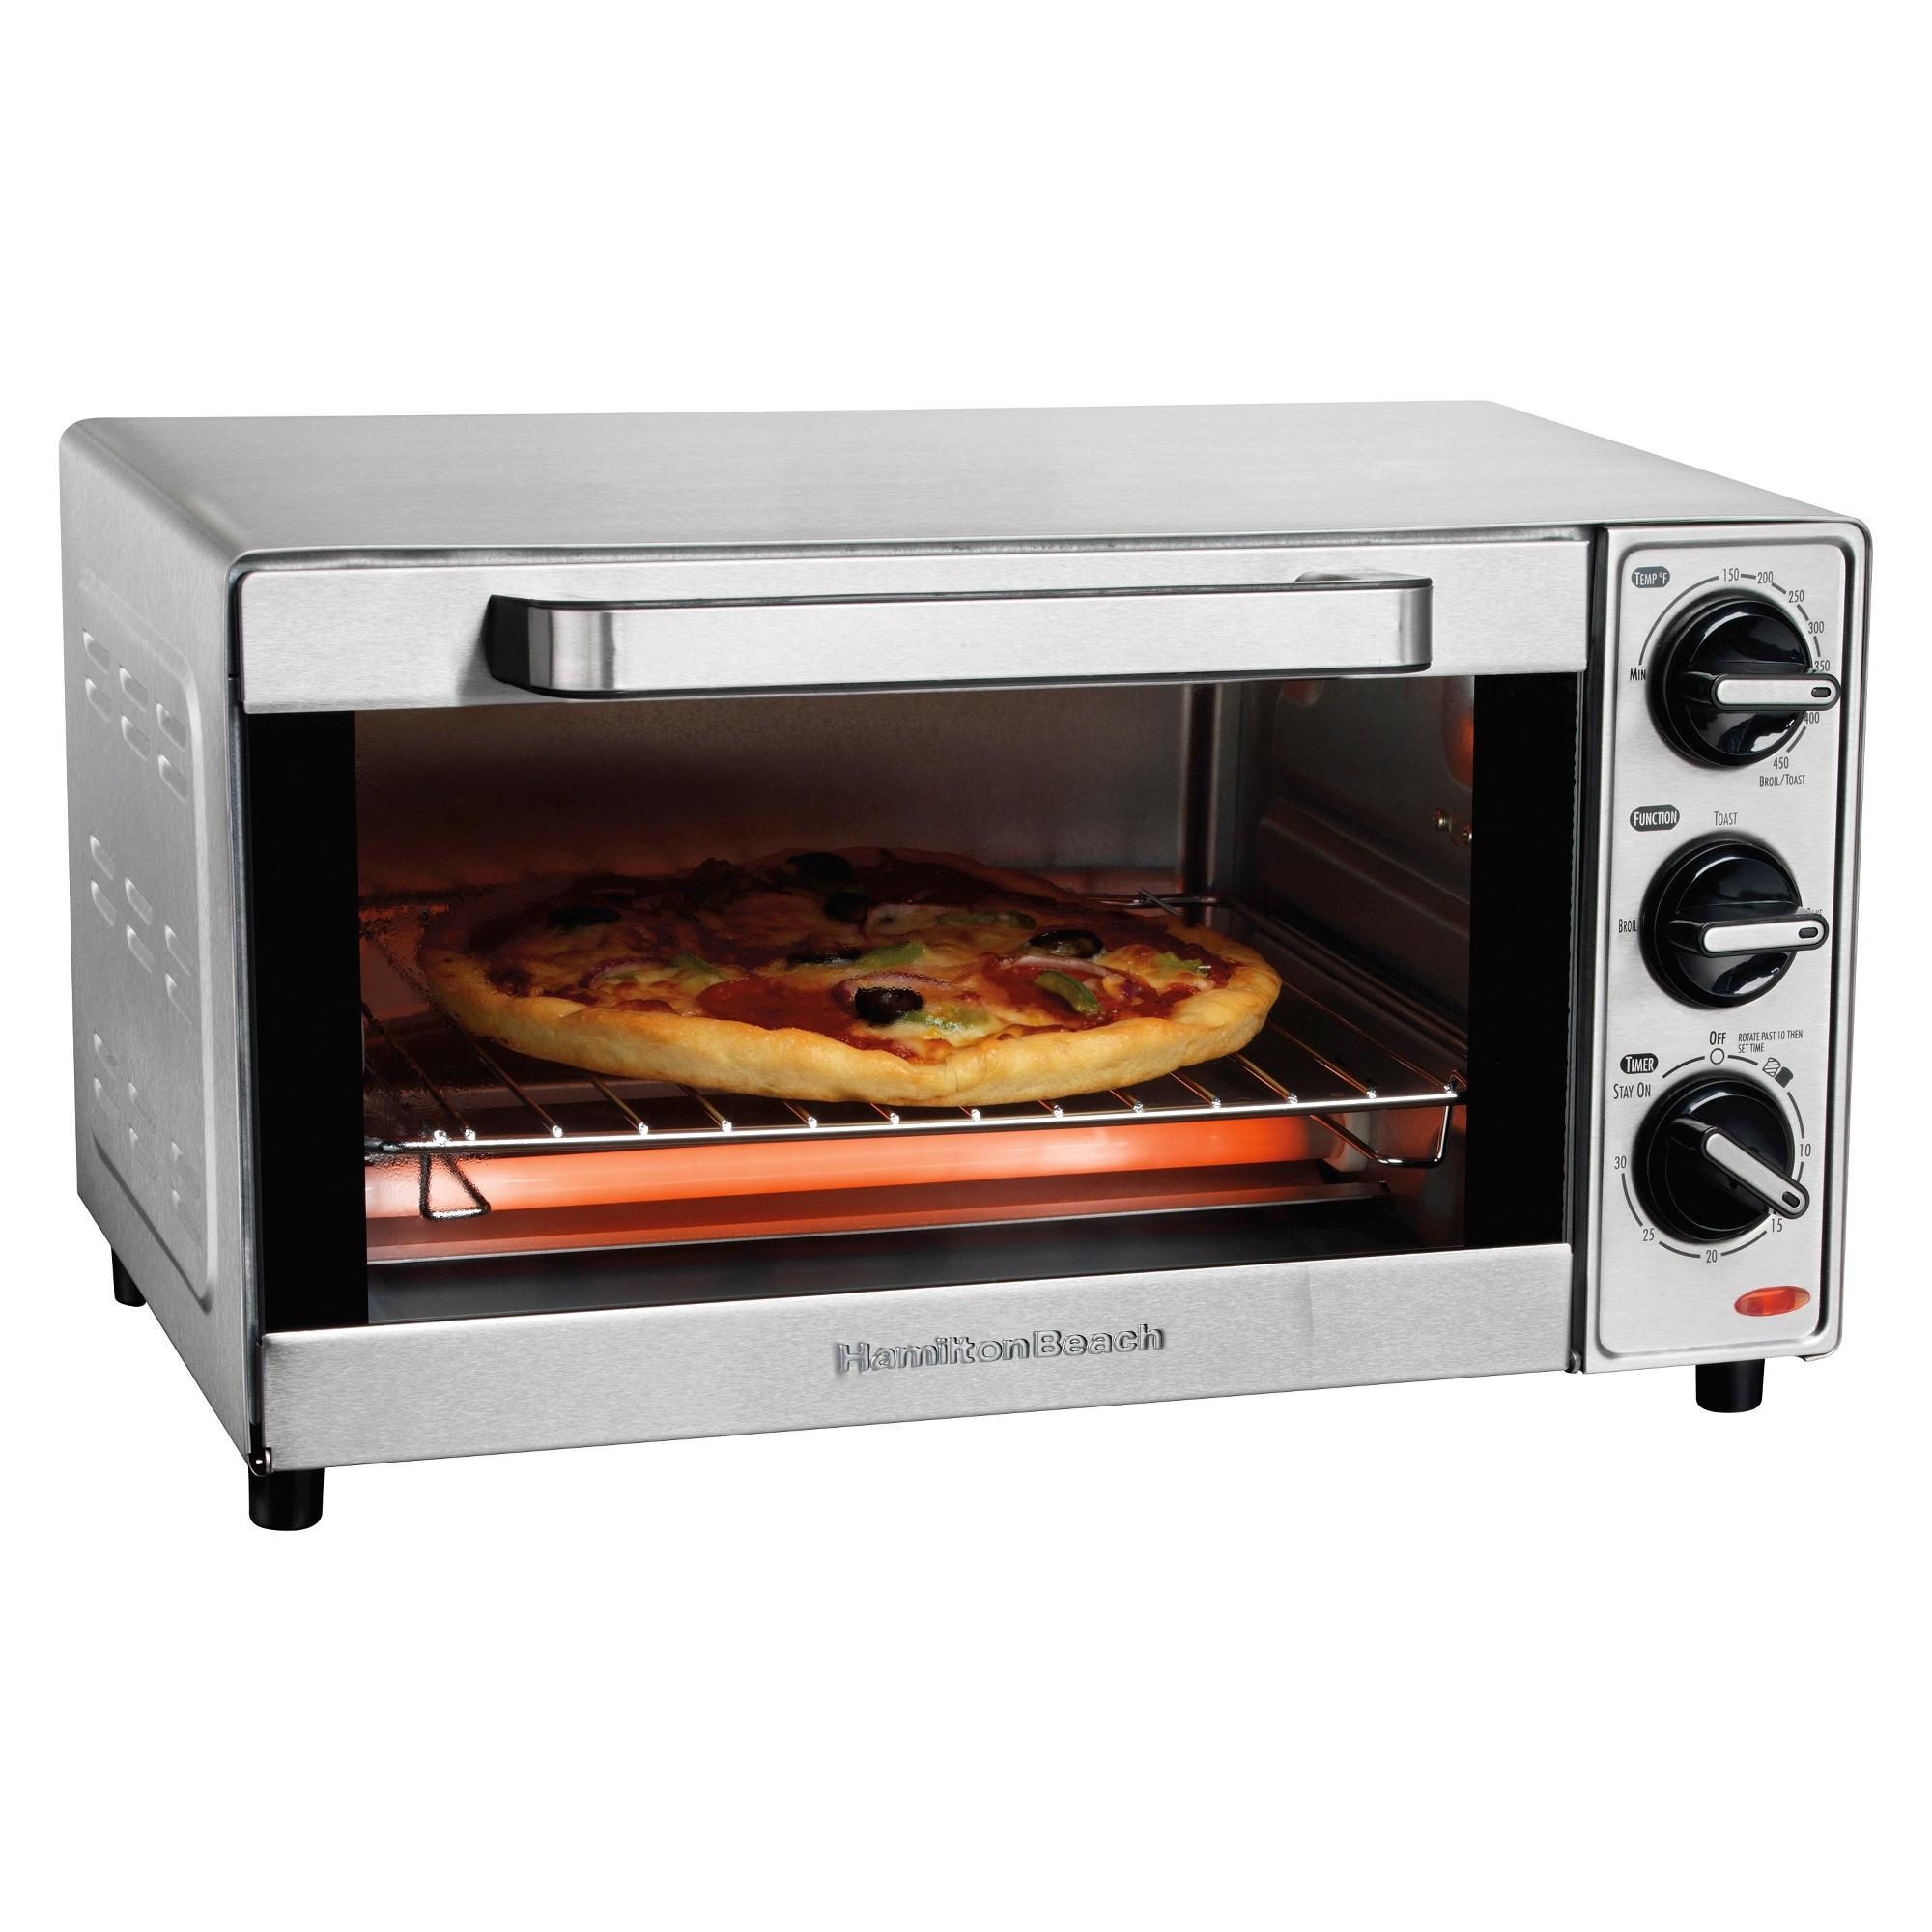 Hamilton Beach 4 Slice Toaster Oven Stainless Steel 31401 Toaster Oven Hamilton Beach Toaster Oven Cooking Appliances